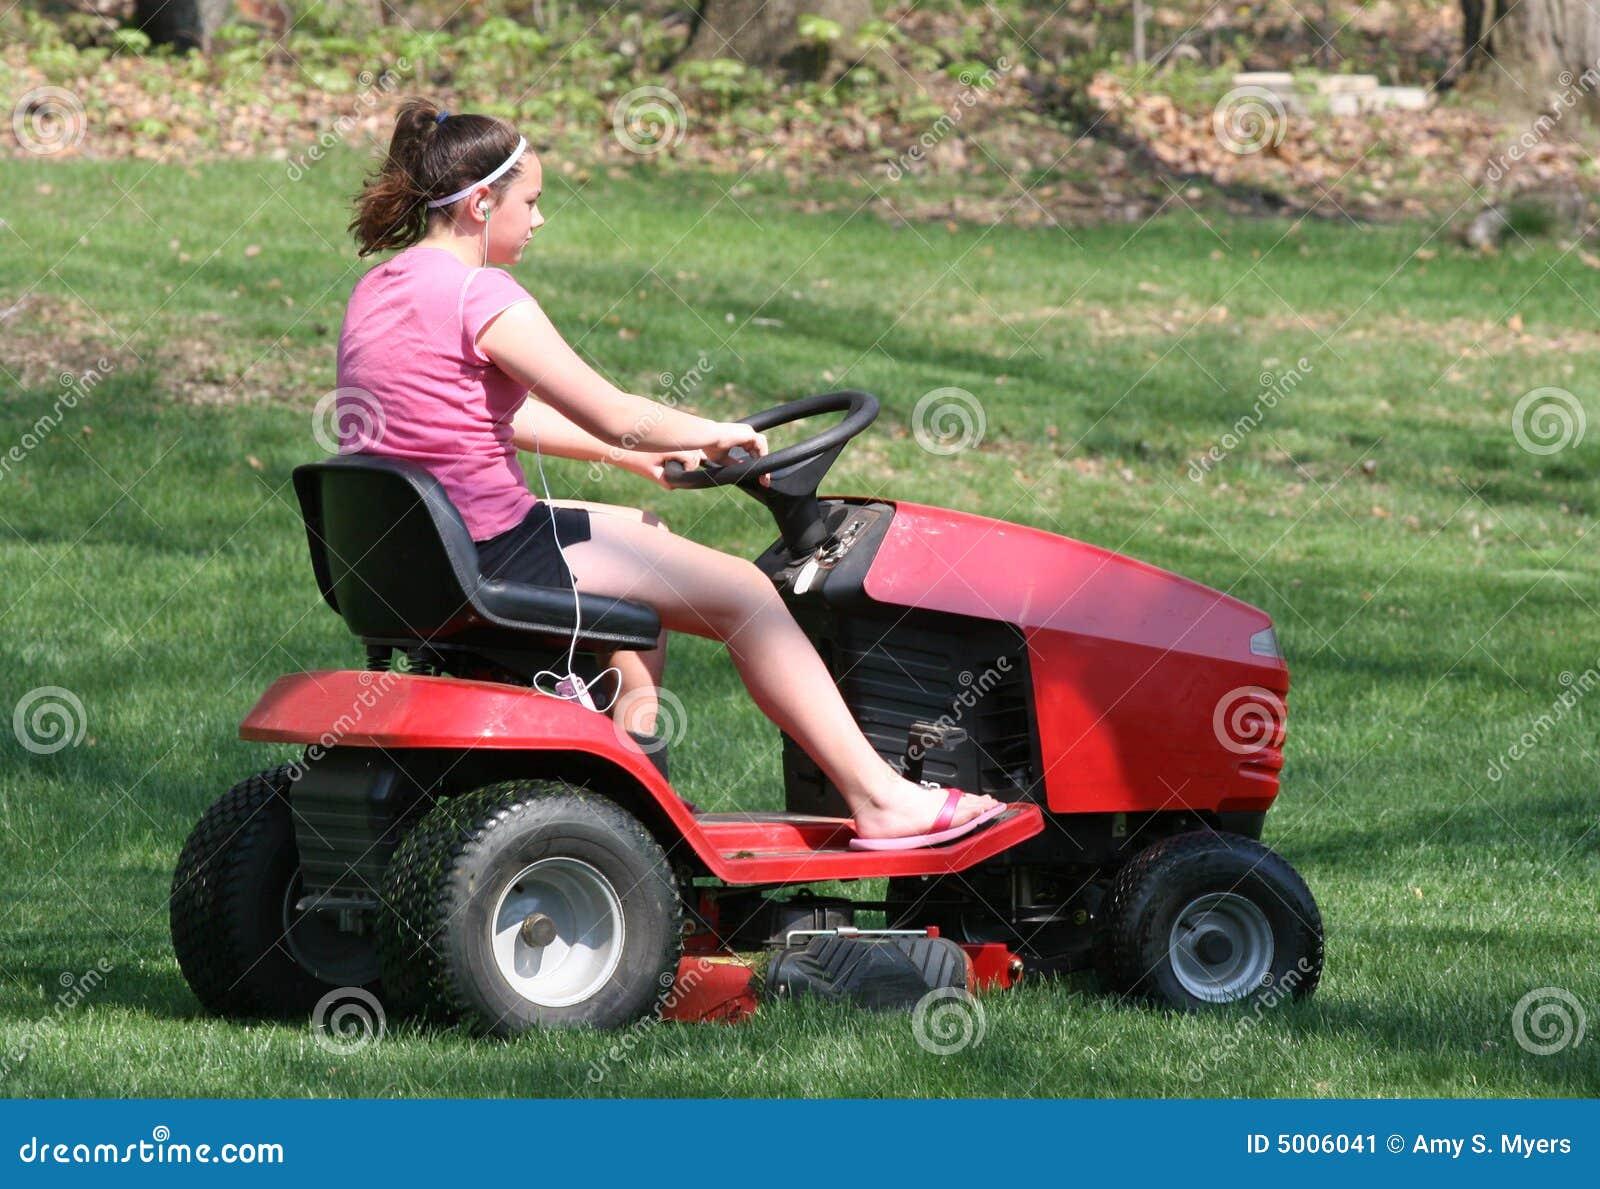 Lawn Mower Seat Trim : Riding mower cartoon vector cartoondealer